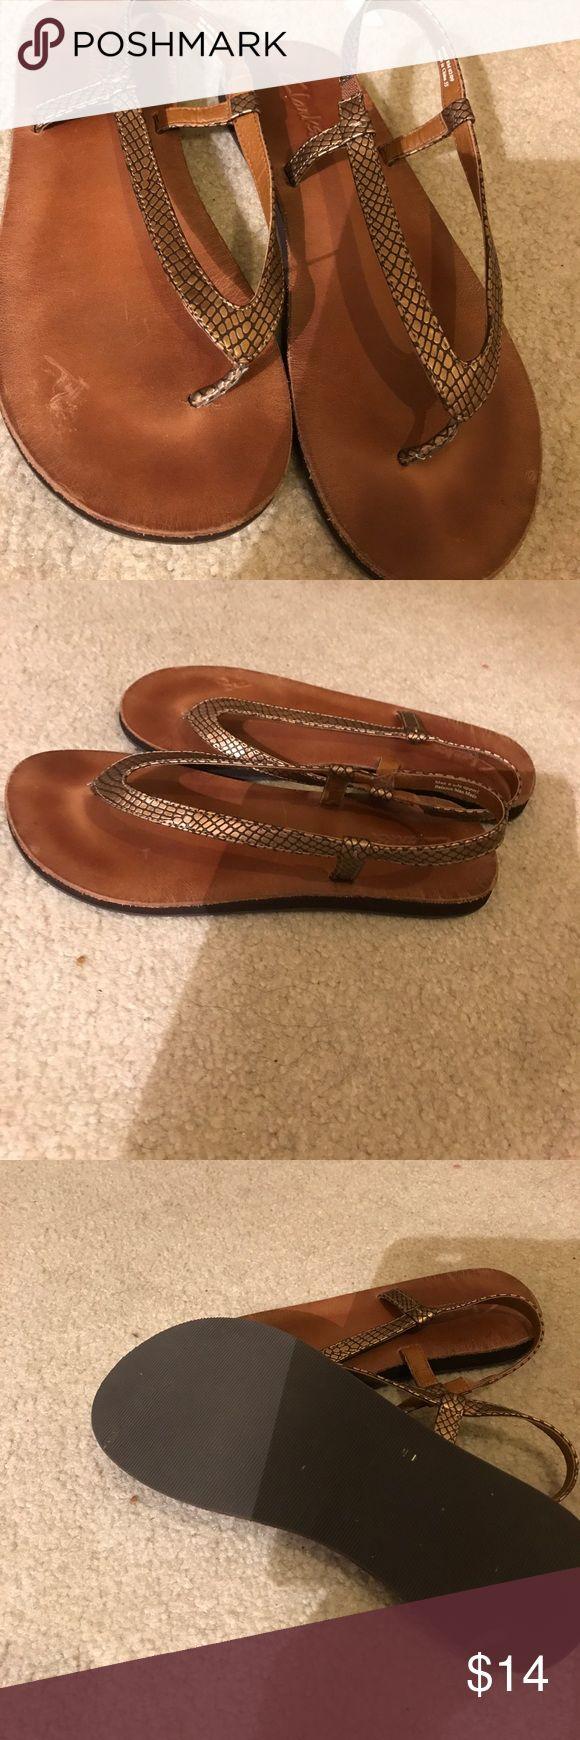 Clarks sandals Clarks womens  sandals  brown size 8 Clarks Shoes Sandals